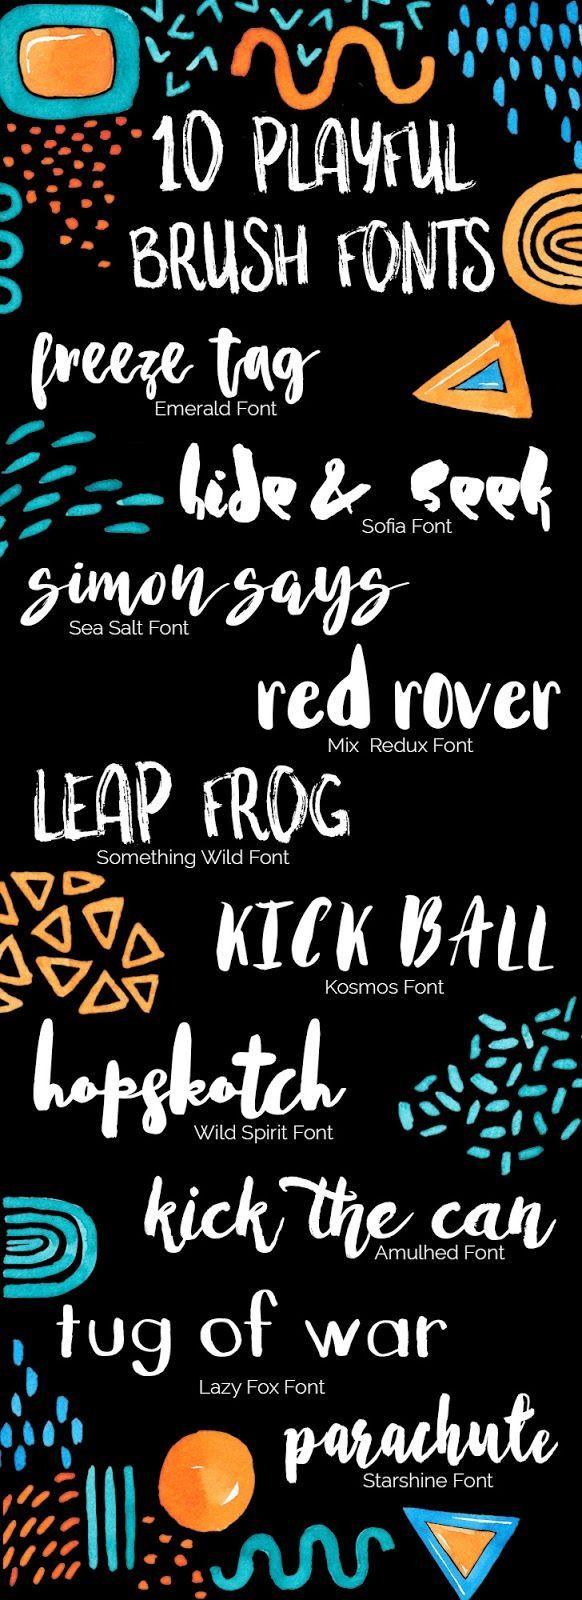 10 Playful Brush Fonts Lettering, Brush font, Fonts